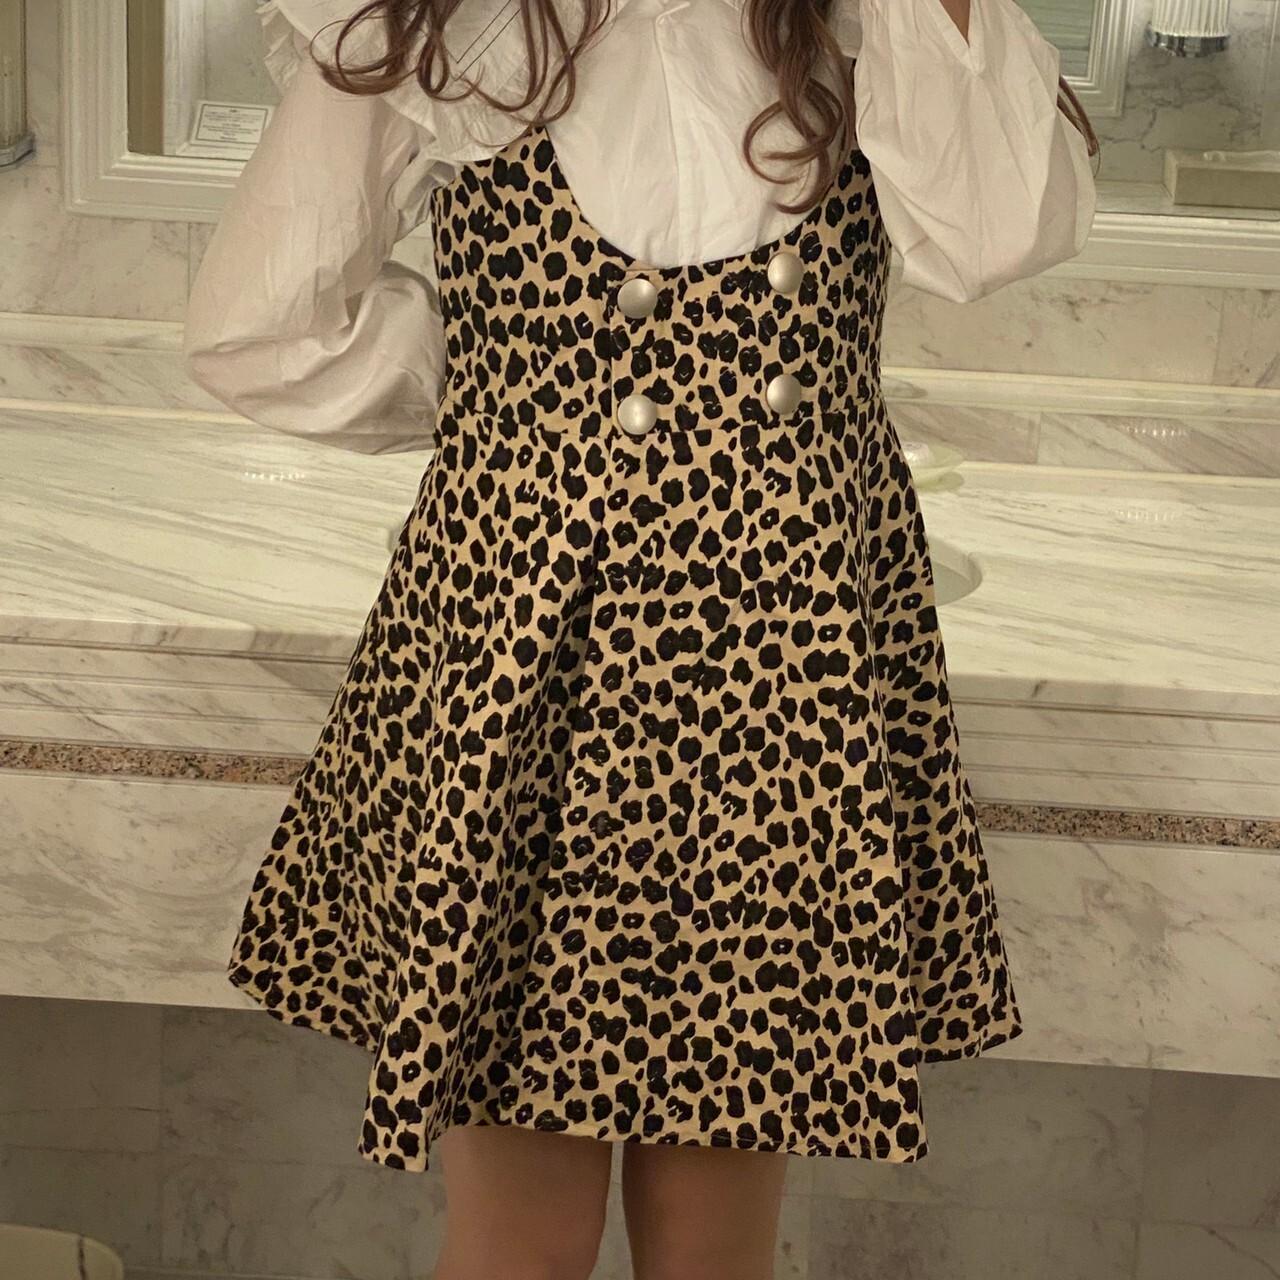 leopard salopette onepiece